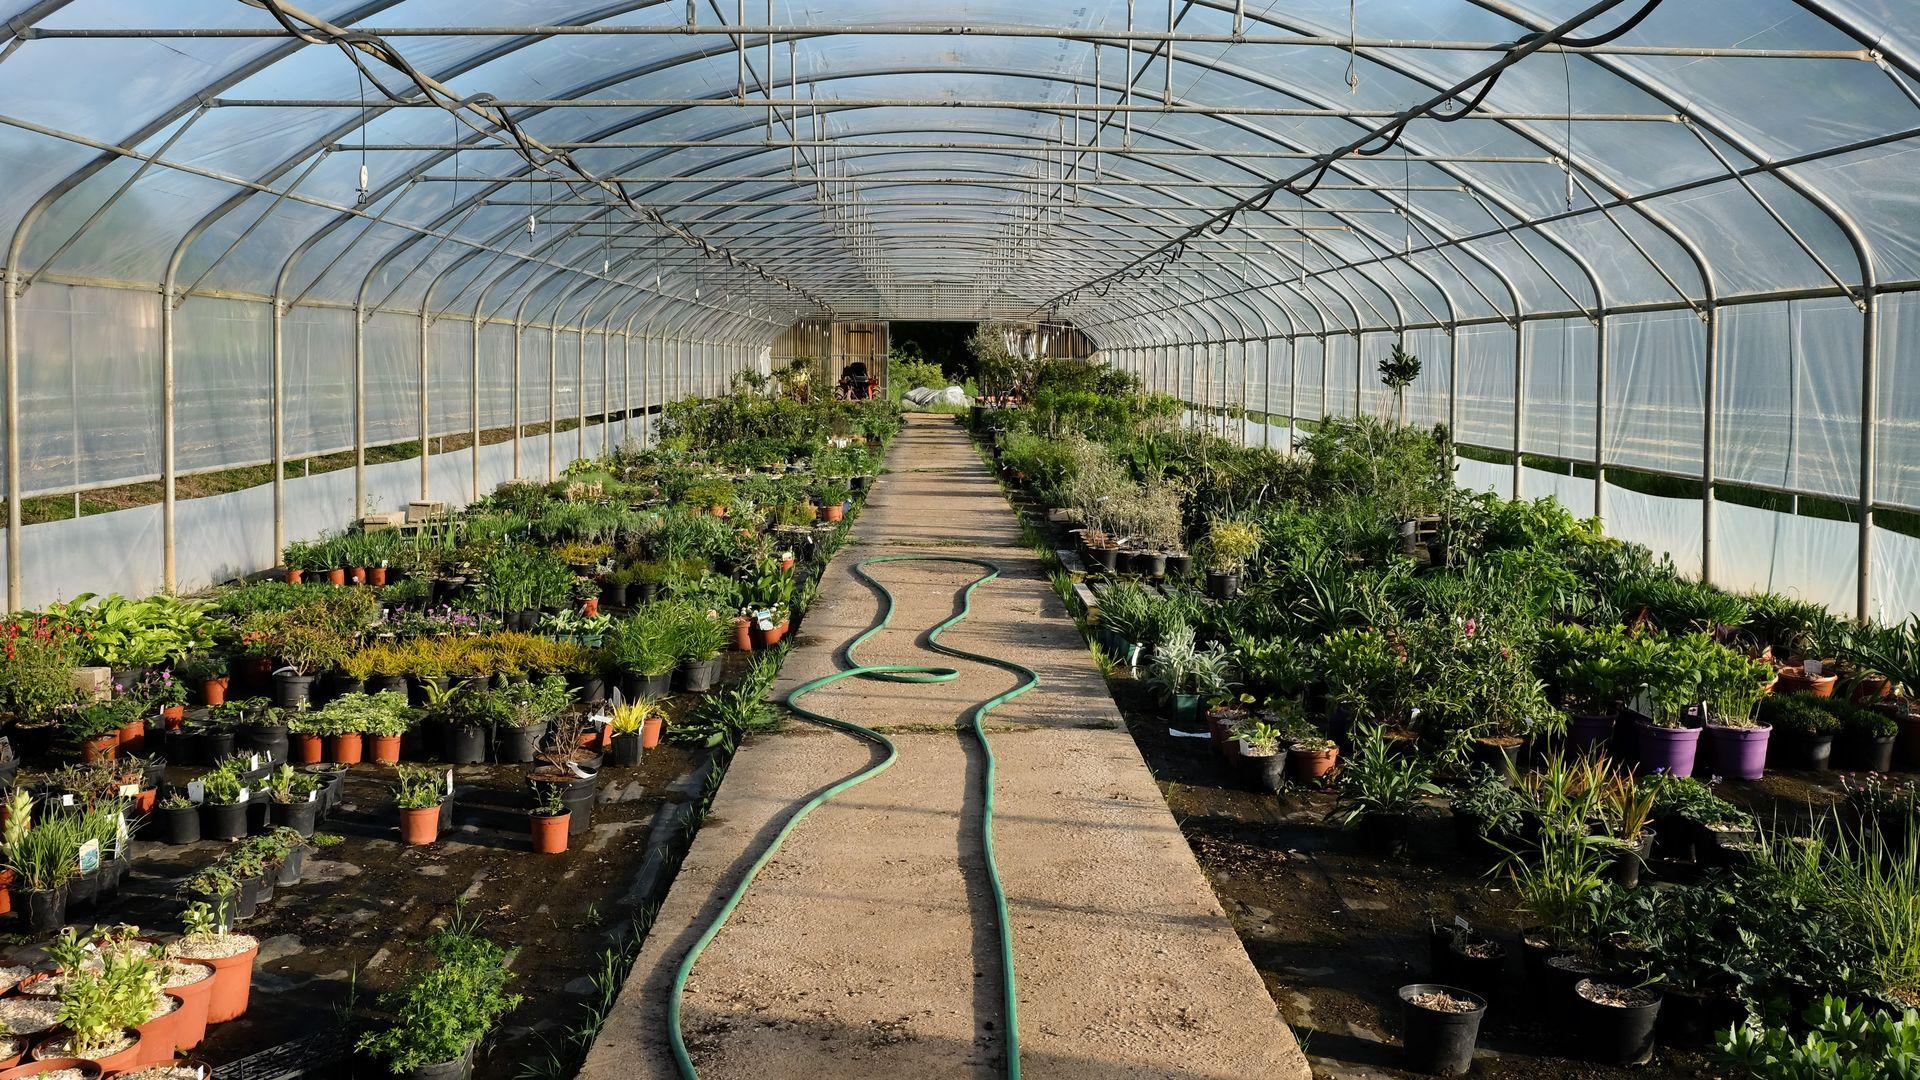 P pini re jardinerie dans le tarn jardins des bastides for Jardinerie des jardins